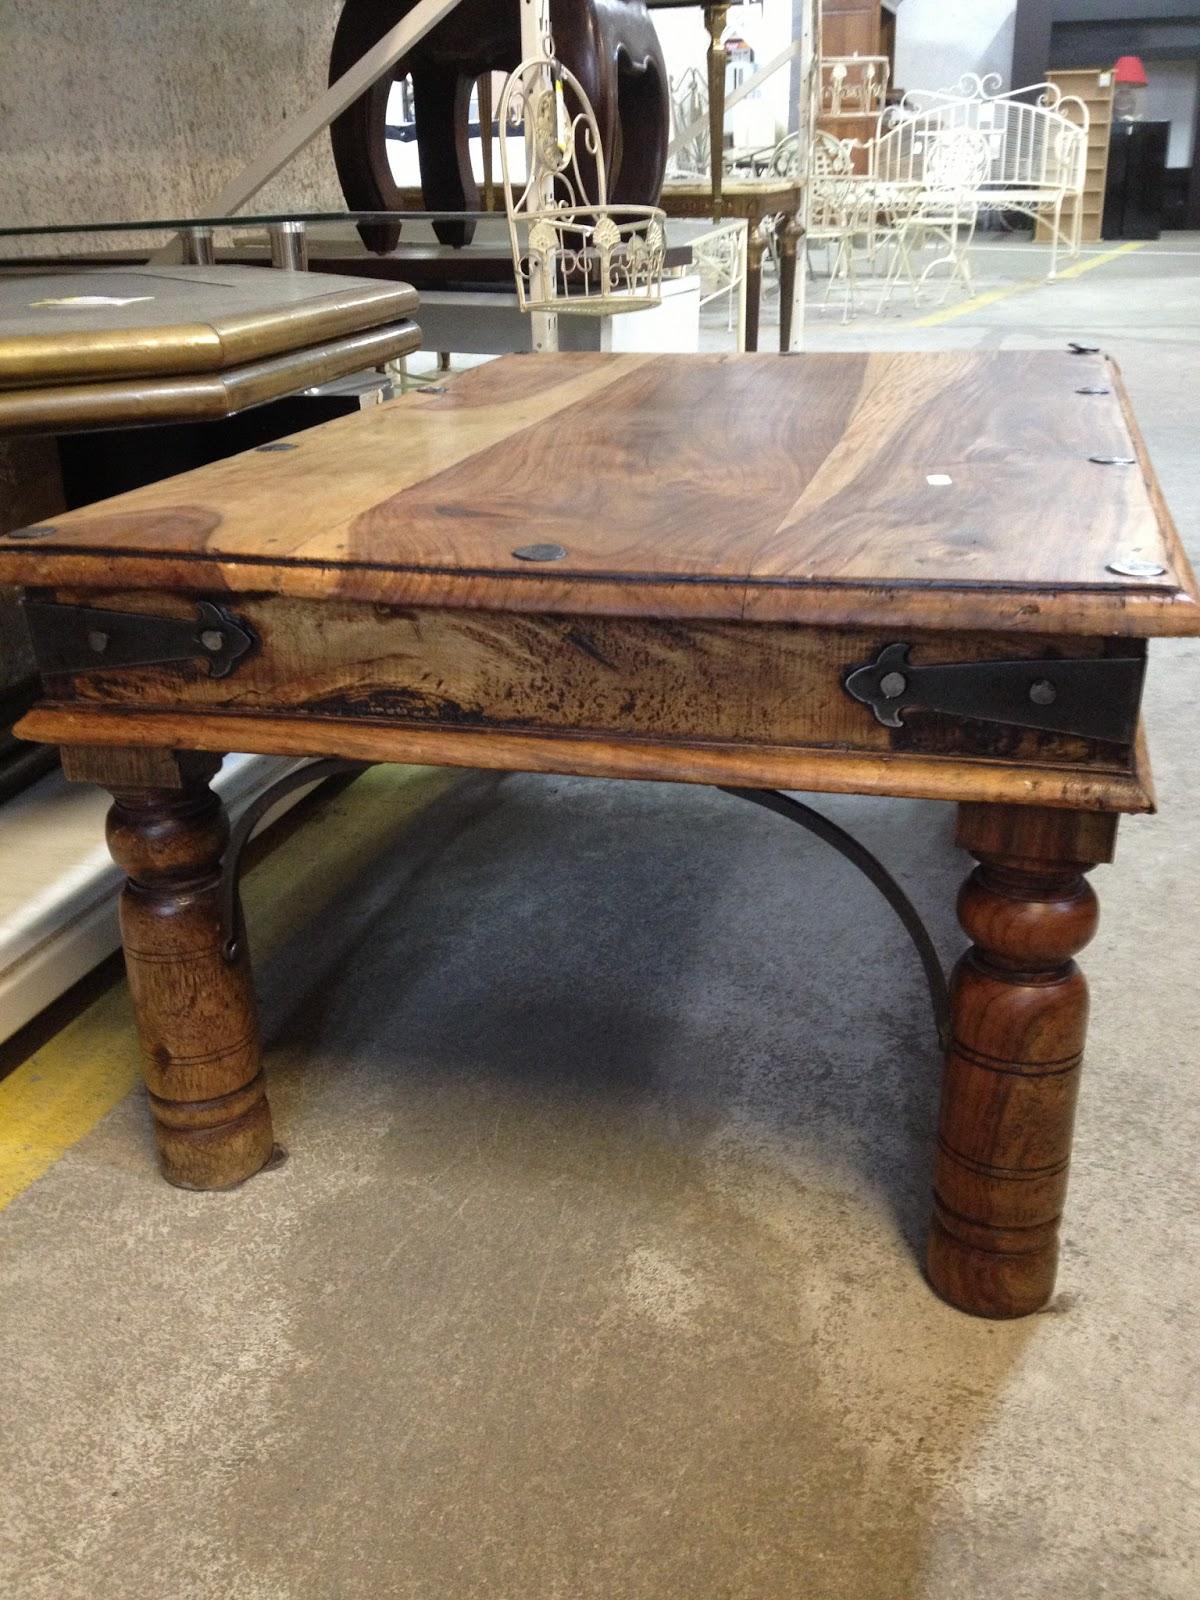 repeindre une table basse en bois vernis atelier. Black Bedroom Furniture Sets. Home Design Ideas